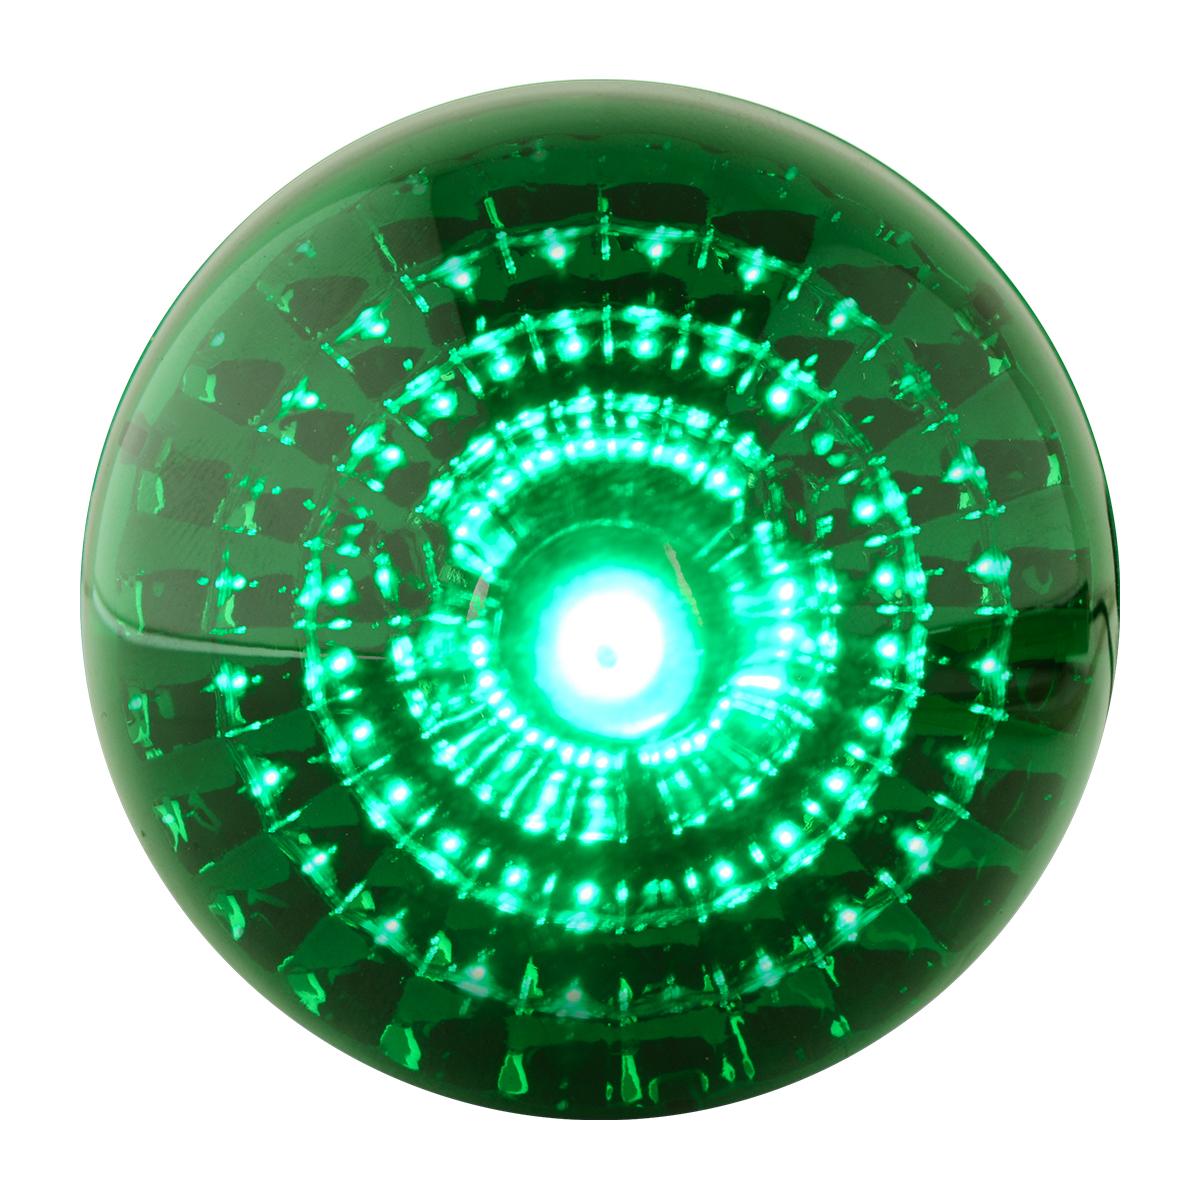 "78492 2"" Beehive Spyder LED Marker Light in Green/Green"